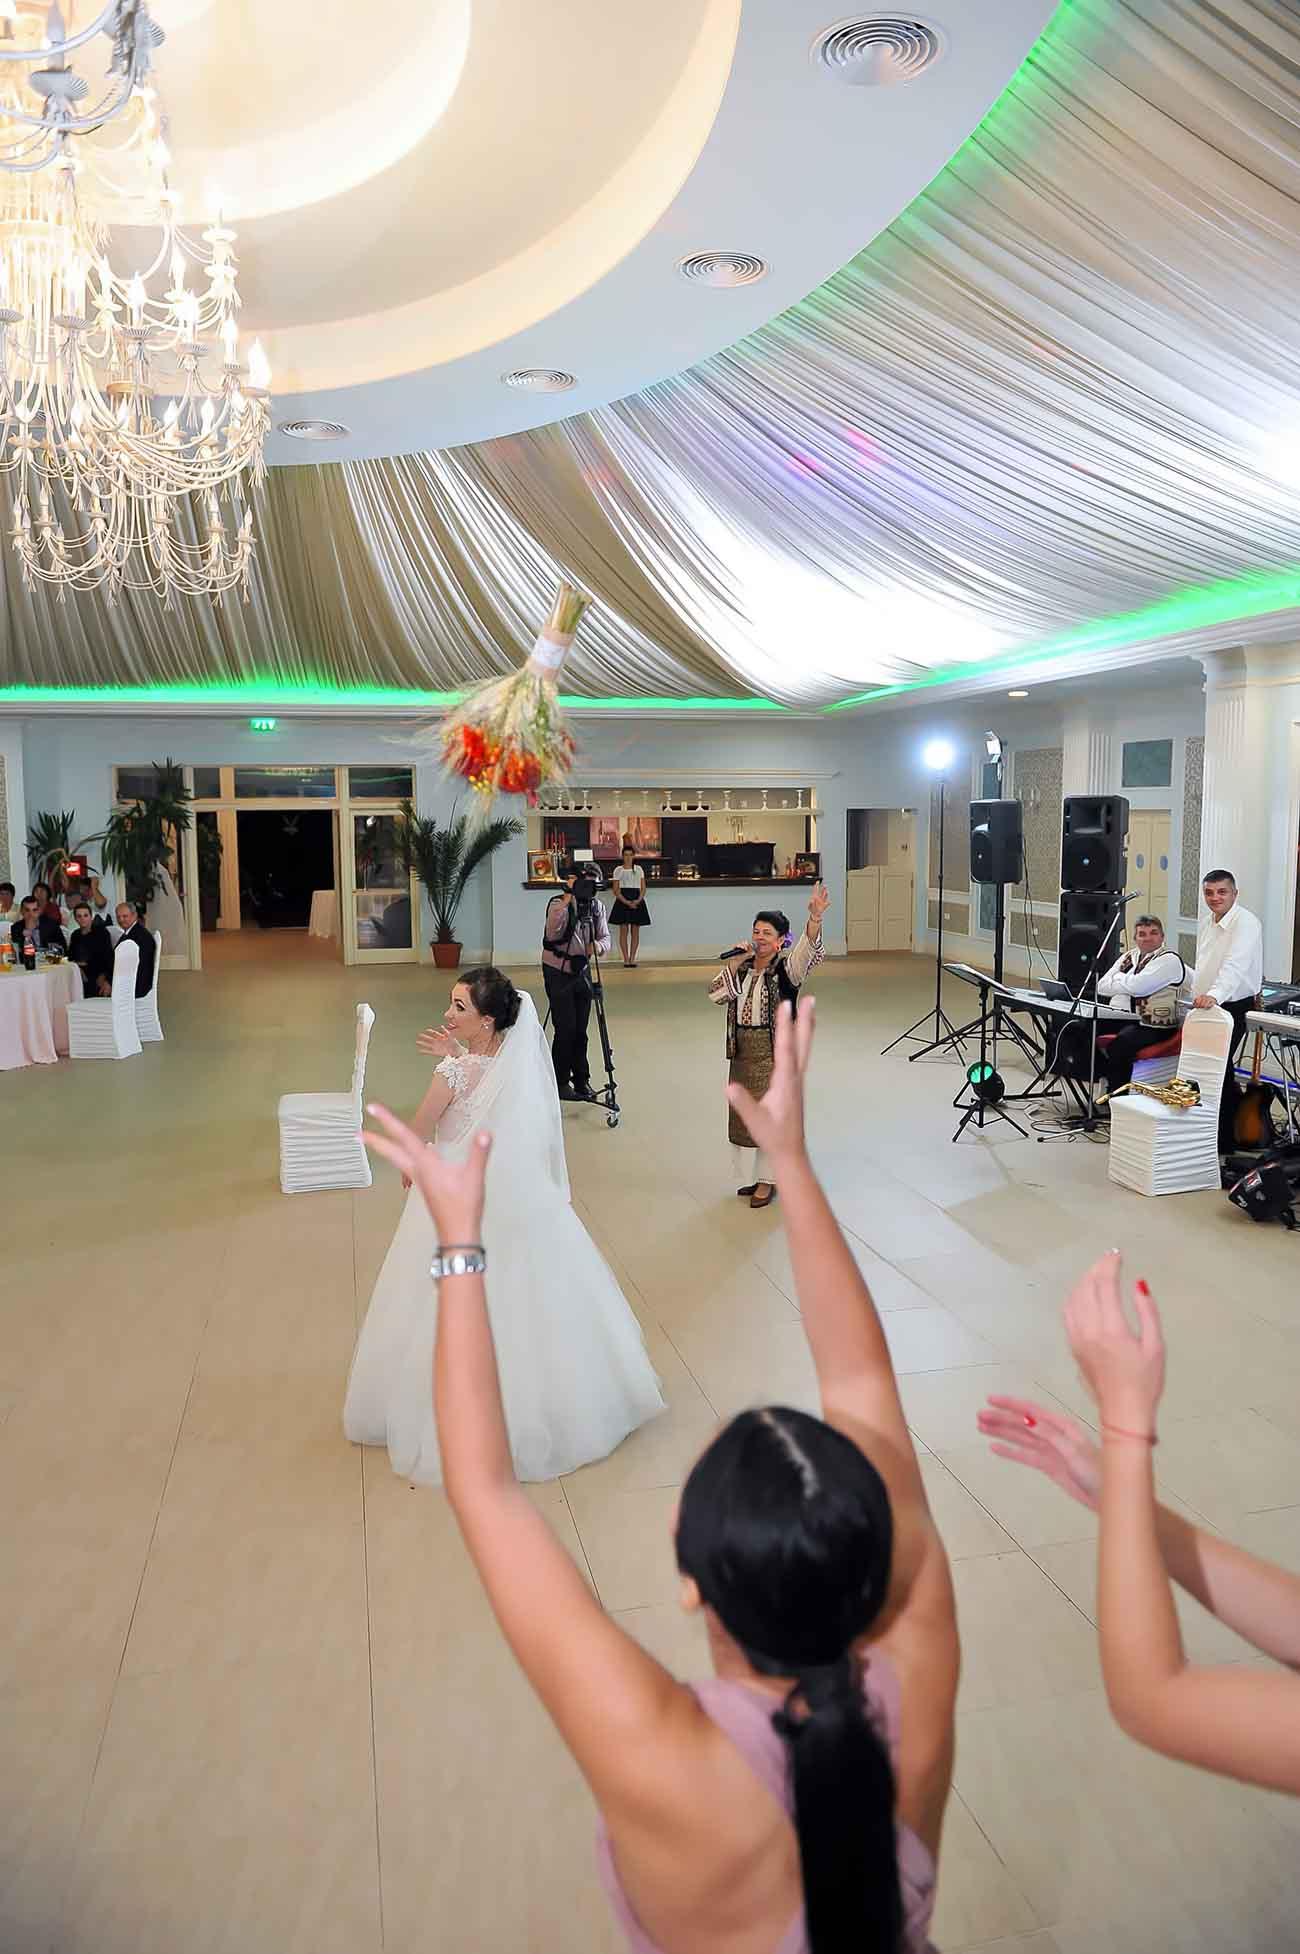 Pret servicii foto video nunta comanesti bacau